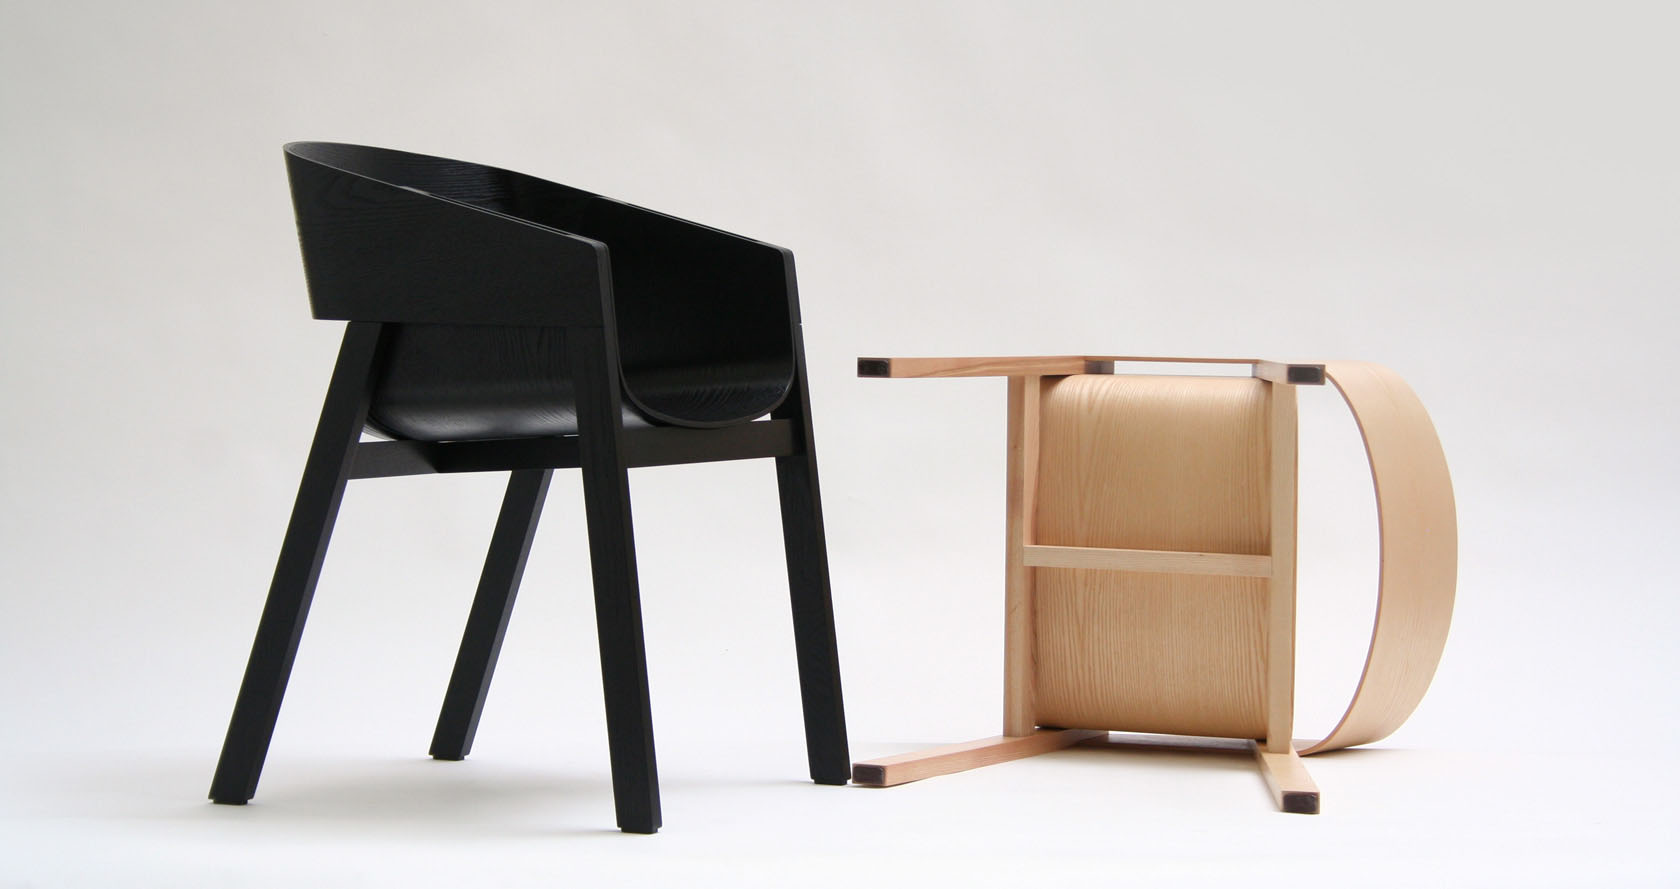 stoel-Merano-Alex-Gufler-kleur-studio